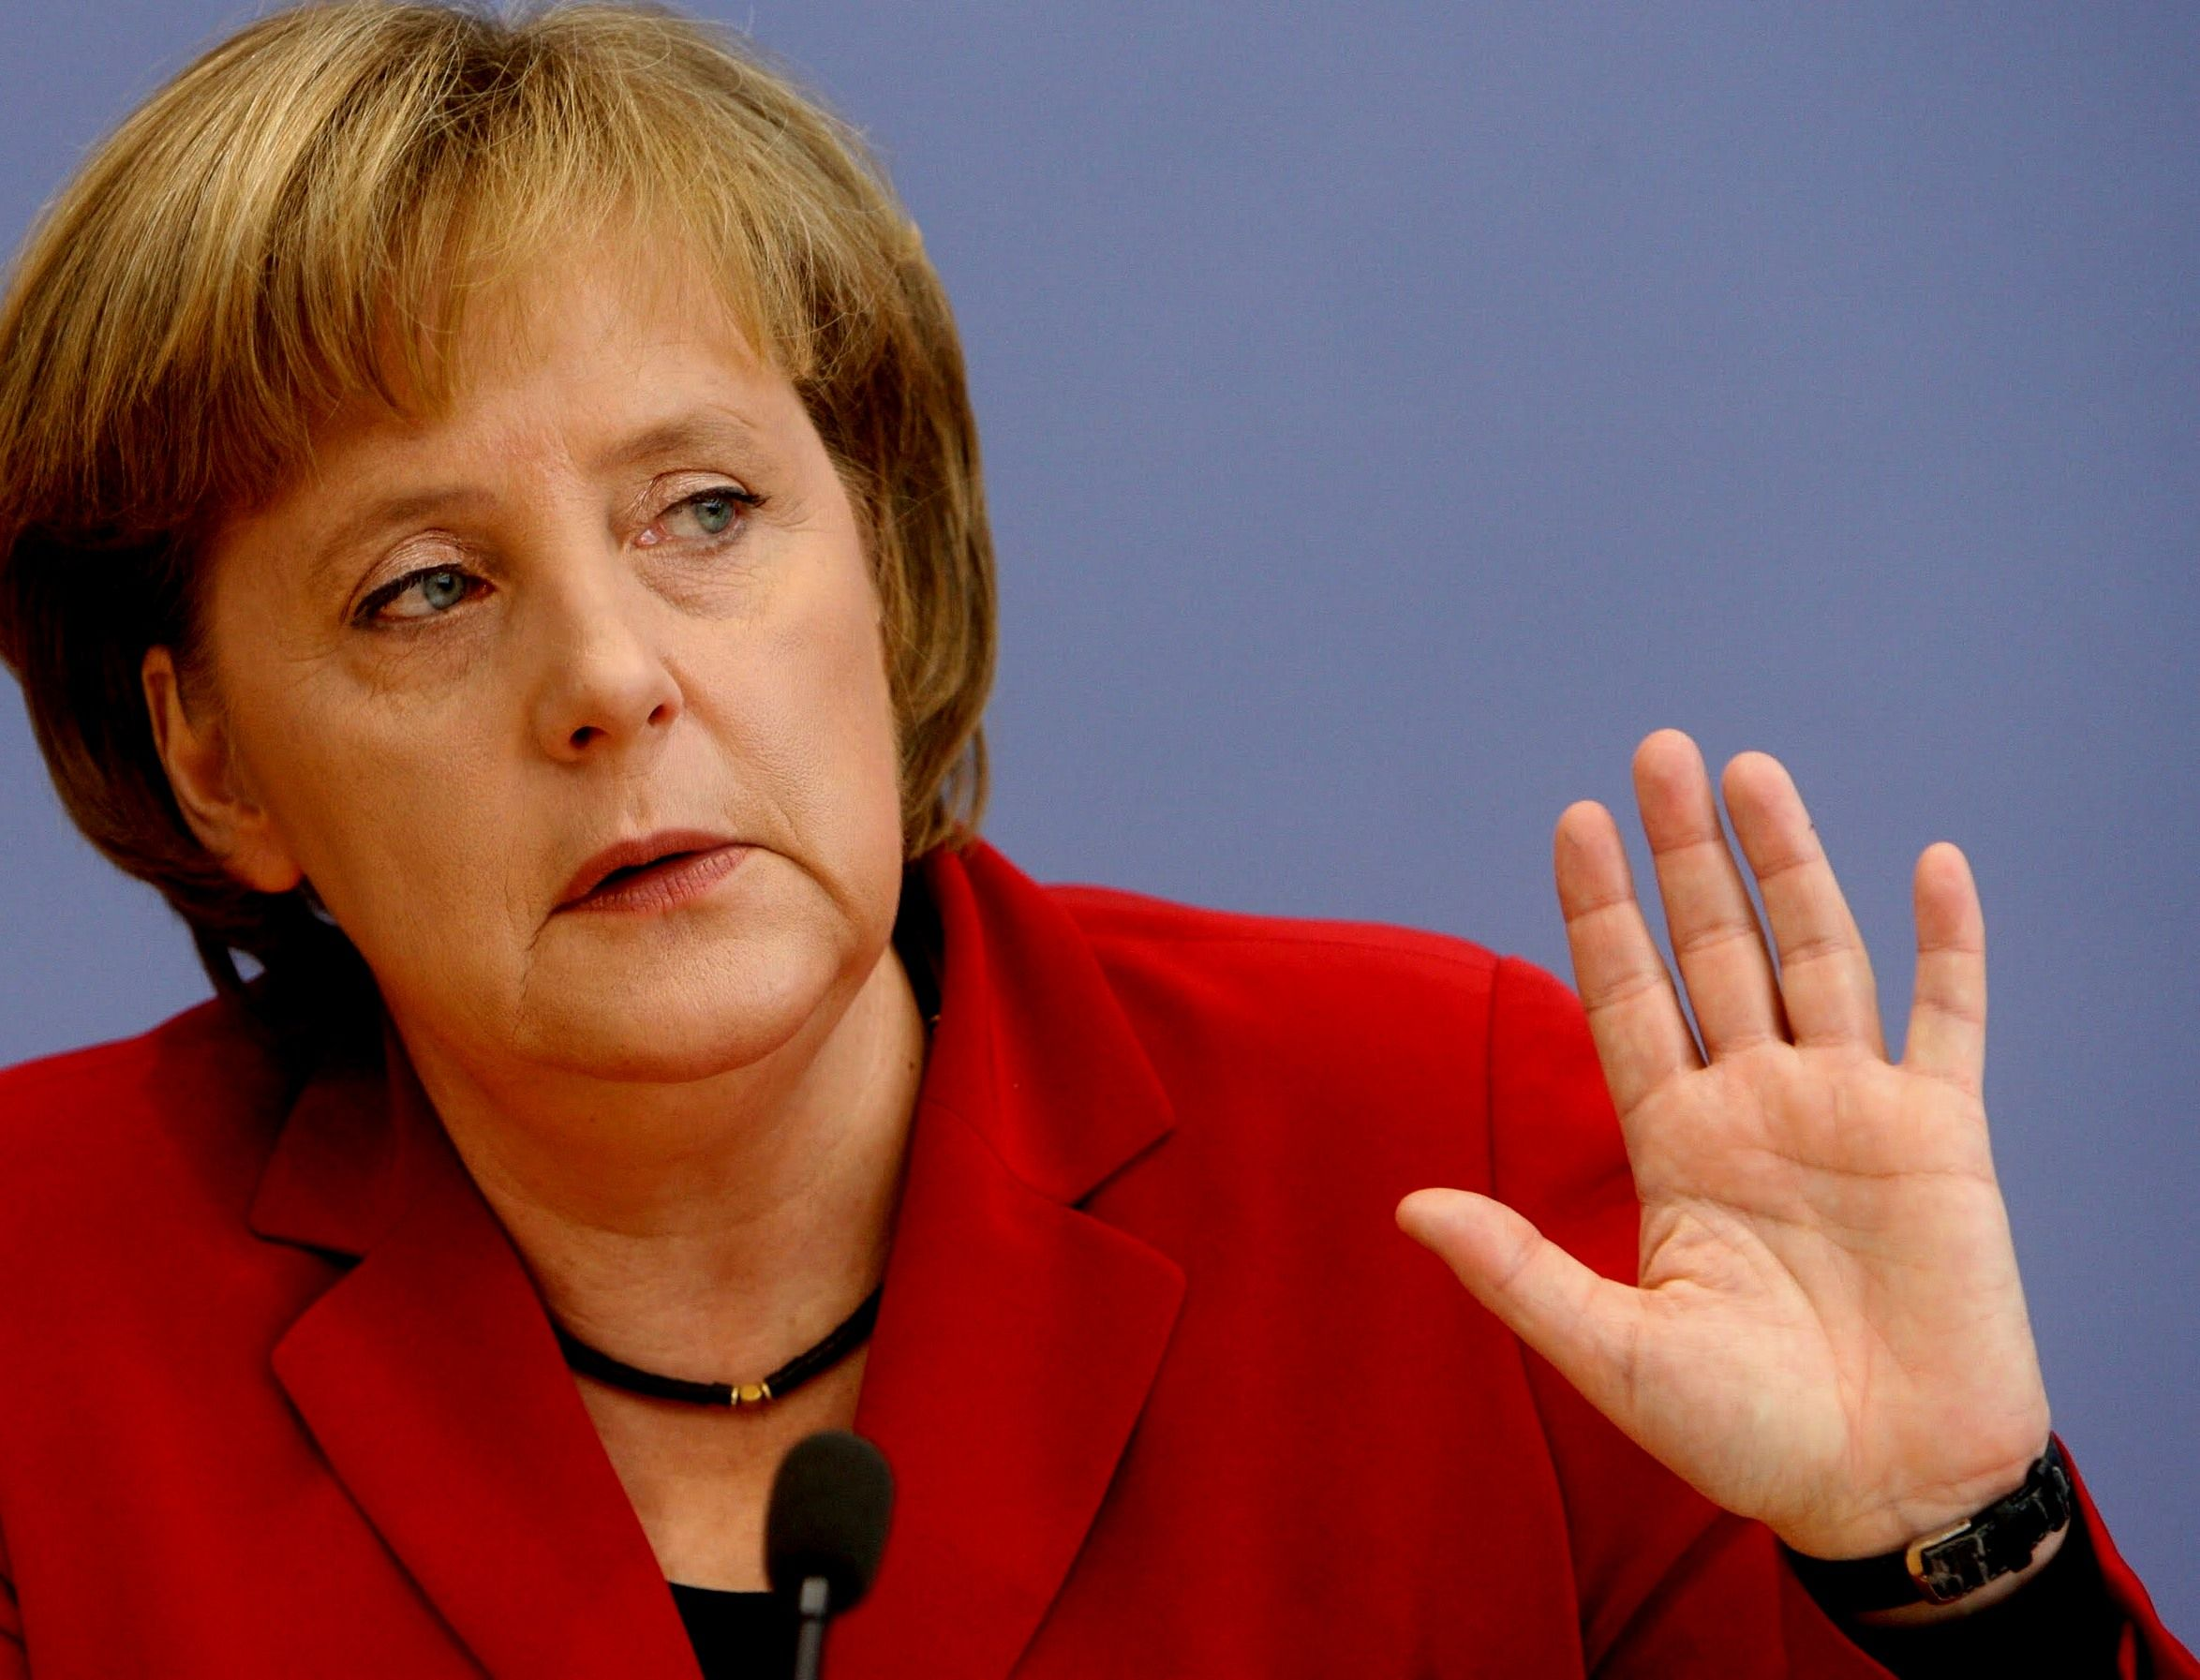 Selfie Celebrity Angela Merkel naked photo 2017